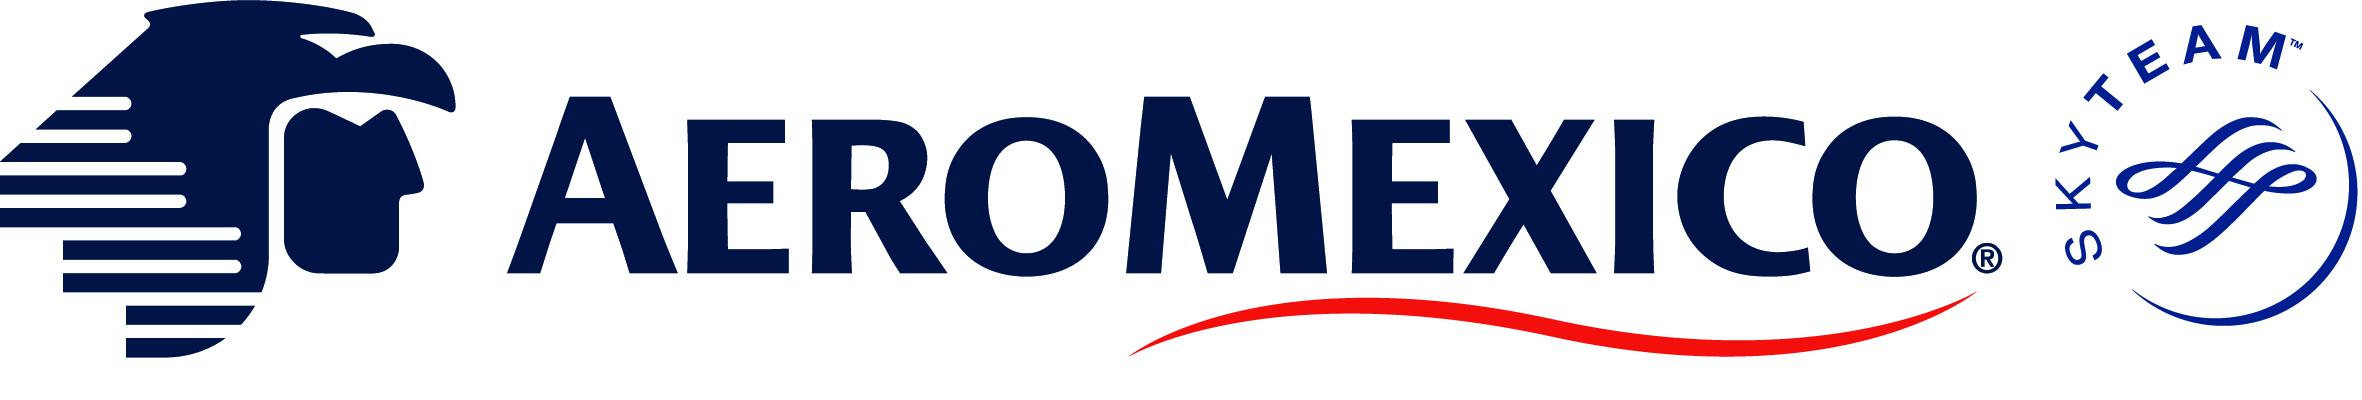 Aeromexico. Download - Aeromexico Skyteam PNG